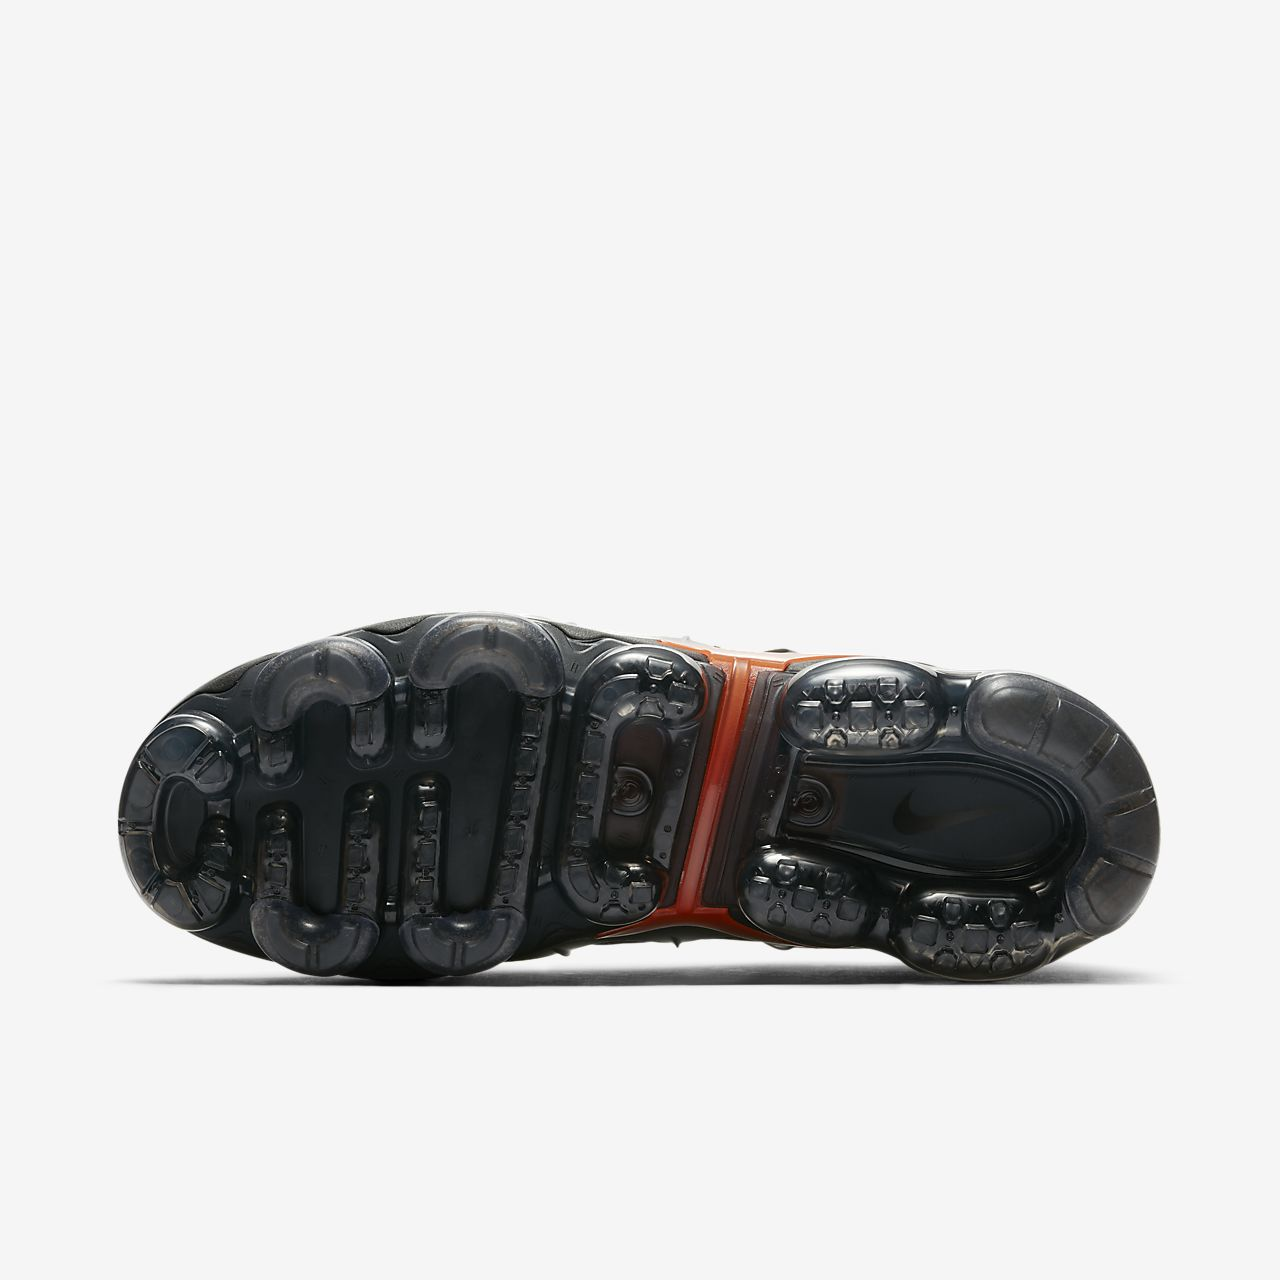 super popular 6d35e d3607 ... Nike Air VaporMax Plus Men s Shoe